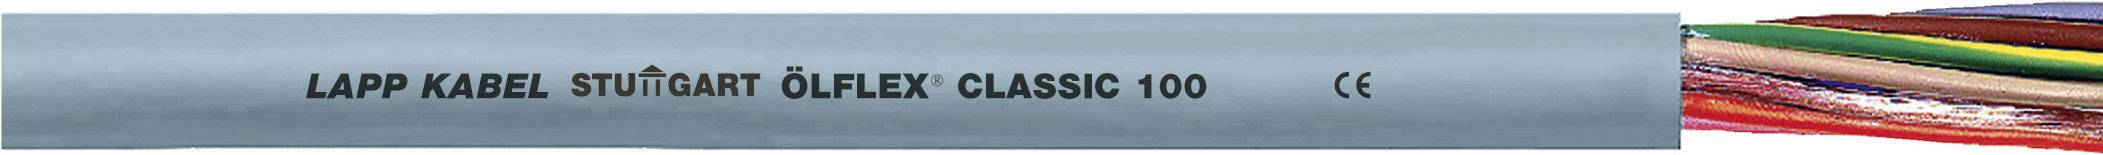 Kabel LappKabel Ölflex CLASSIC 100 40G0,5 (0010016), PVC, 15,4 mm, 500 V, šedá, 50 m